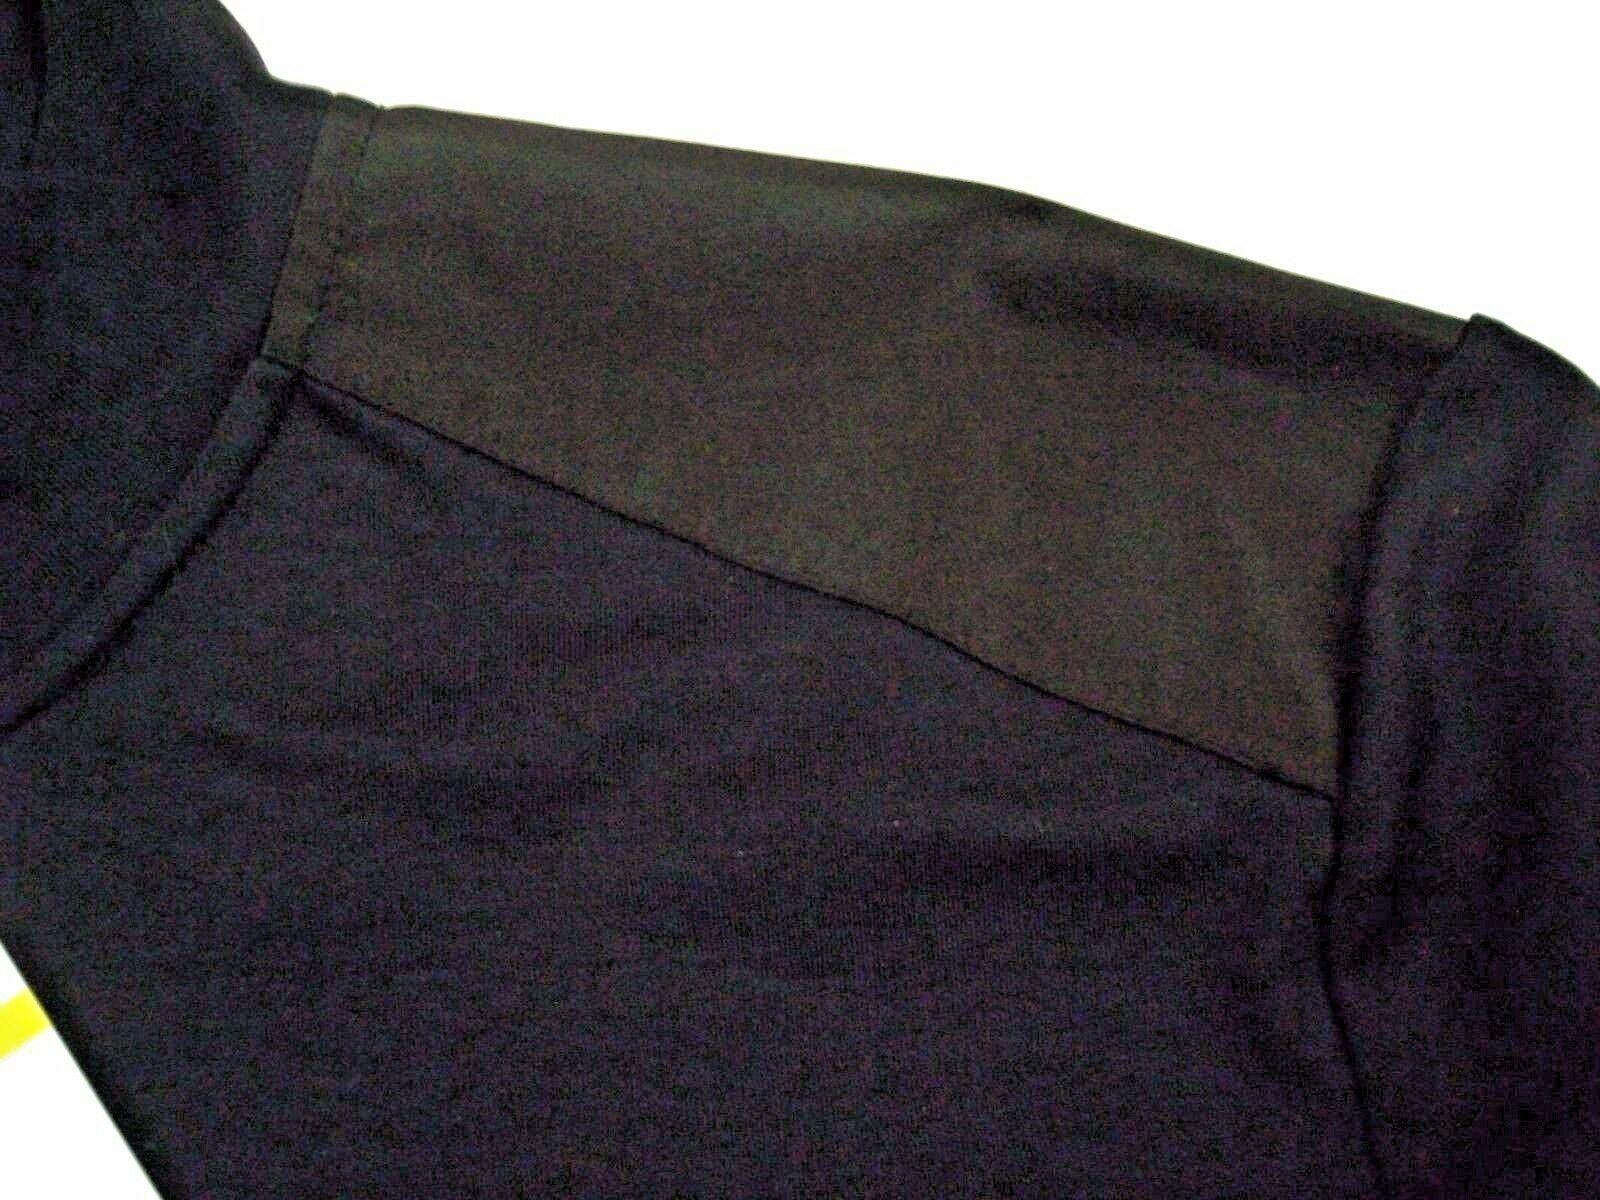 NWT Calvin Klein Liquid Cotton Active Top Men's Size Medium Black 100% Cotton